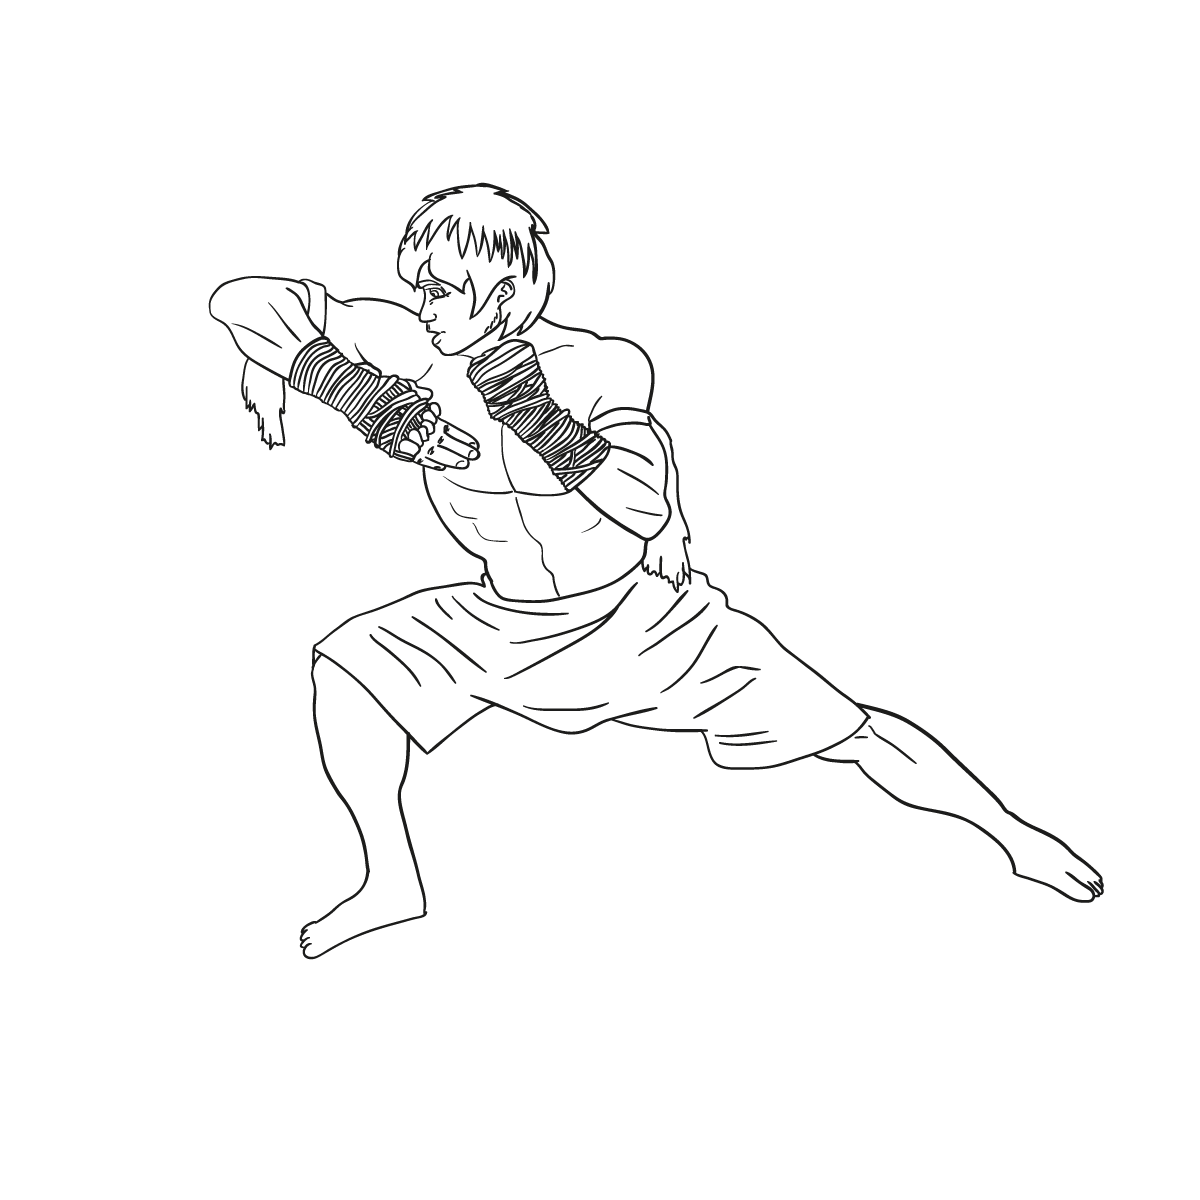 Da 28 Artes marciales  365 das 365 dibujos